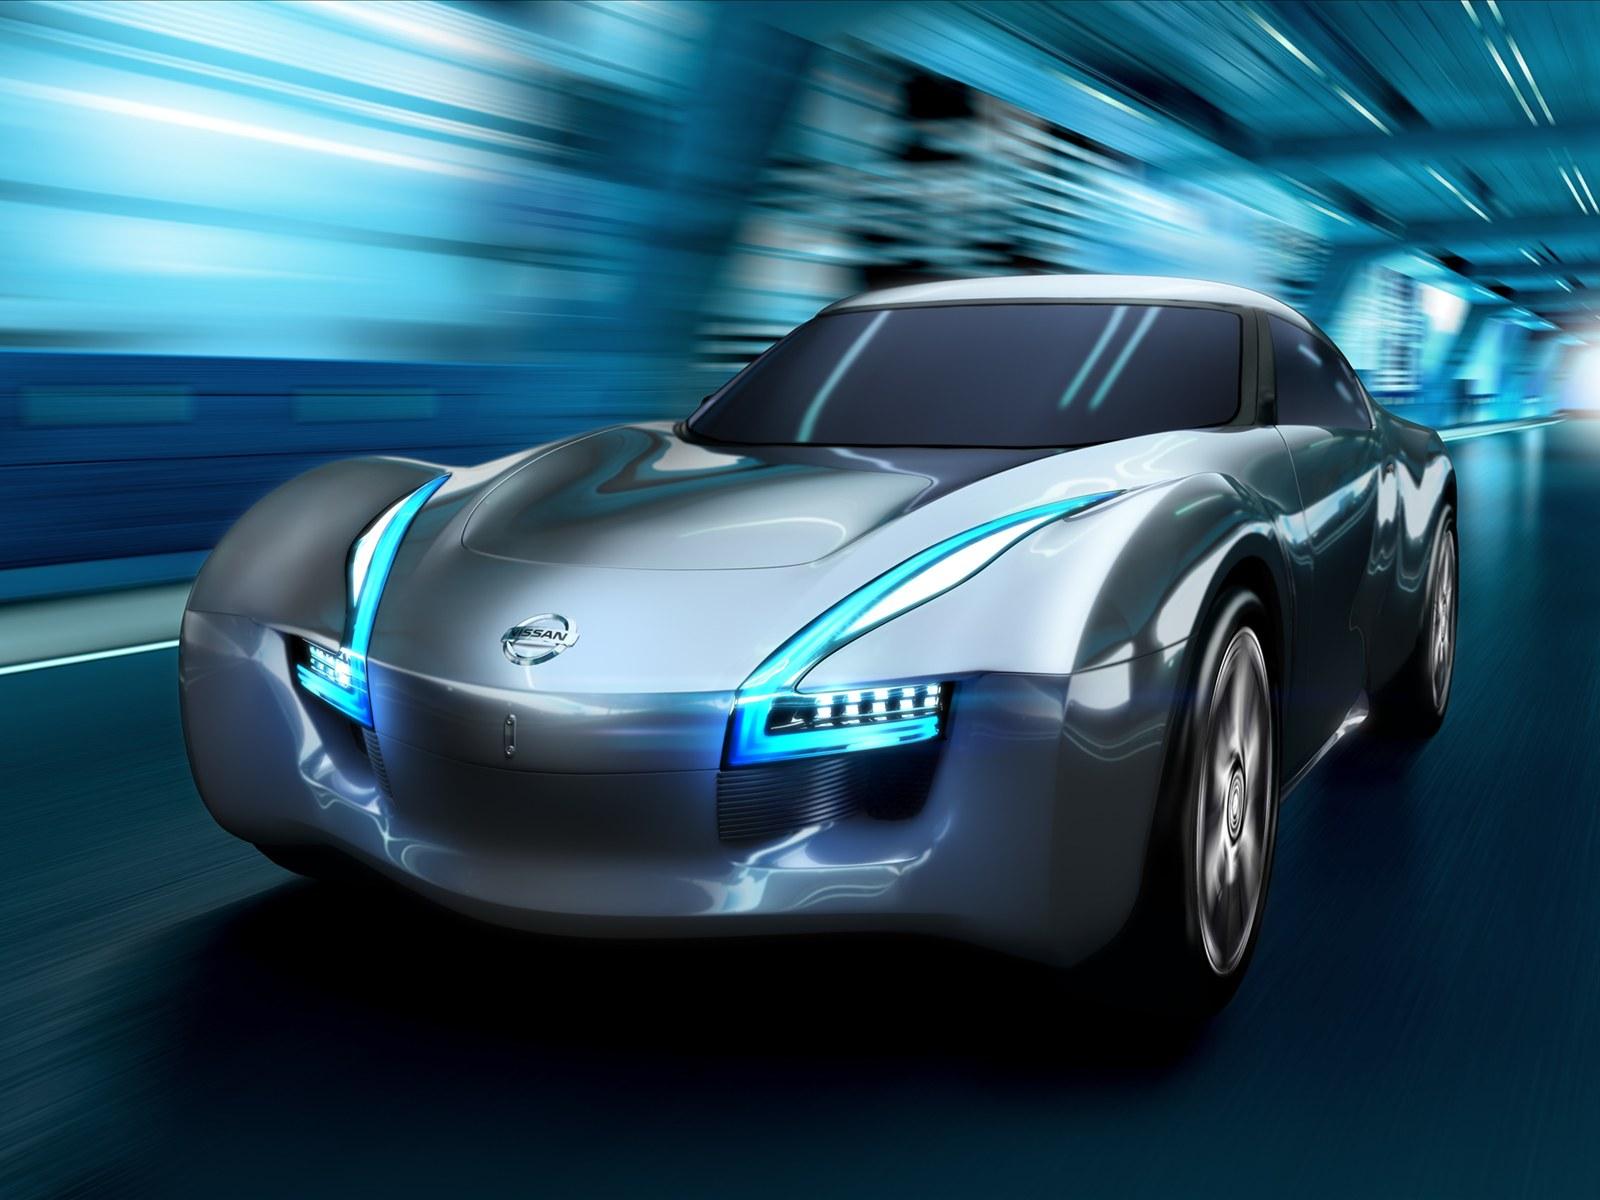 car pictures nissan esflow electric concept car 2011. Black Bedroom Furniture Sets. Home Design Ideas